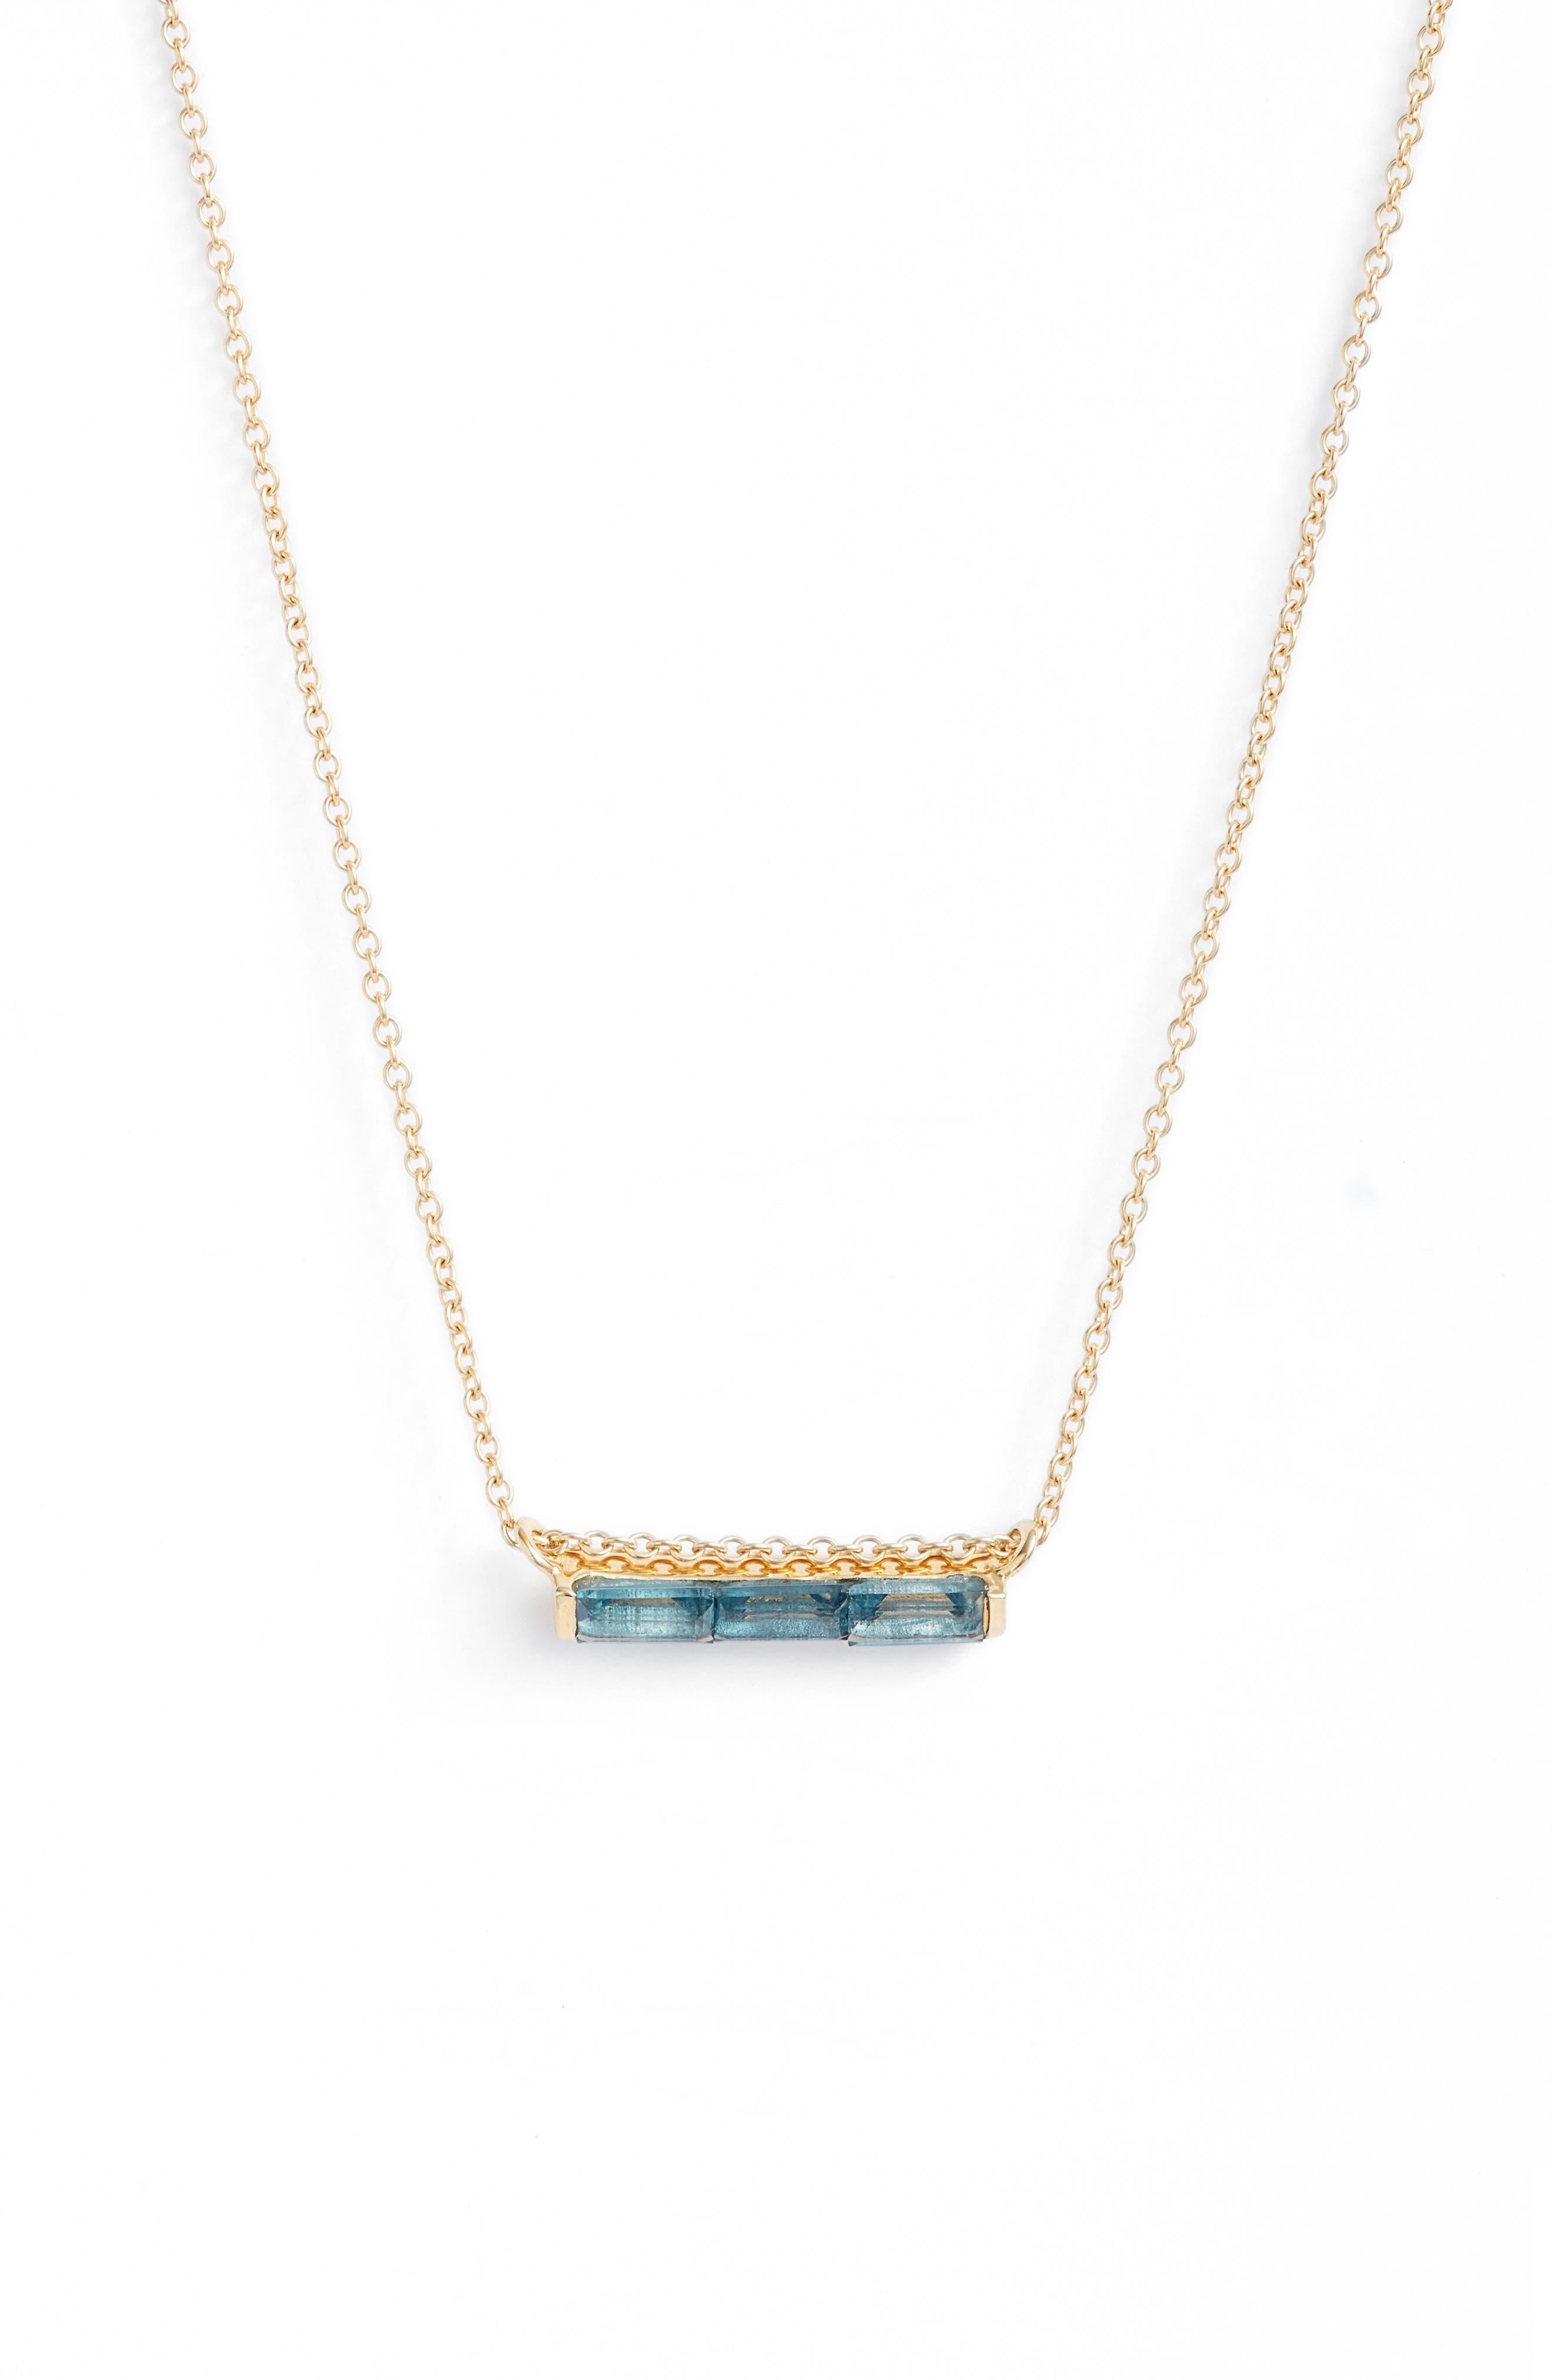 Channel Set Semiprecious Stone Necklace,                         Main,                         color, Blue Topaz/ Gold